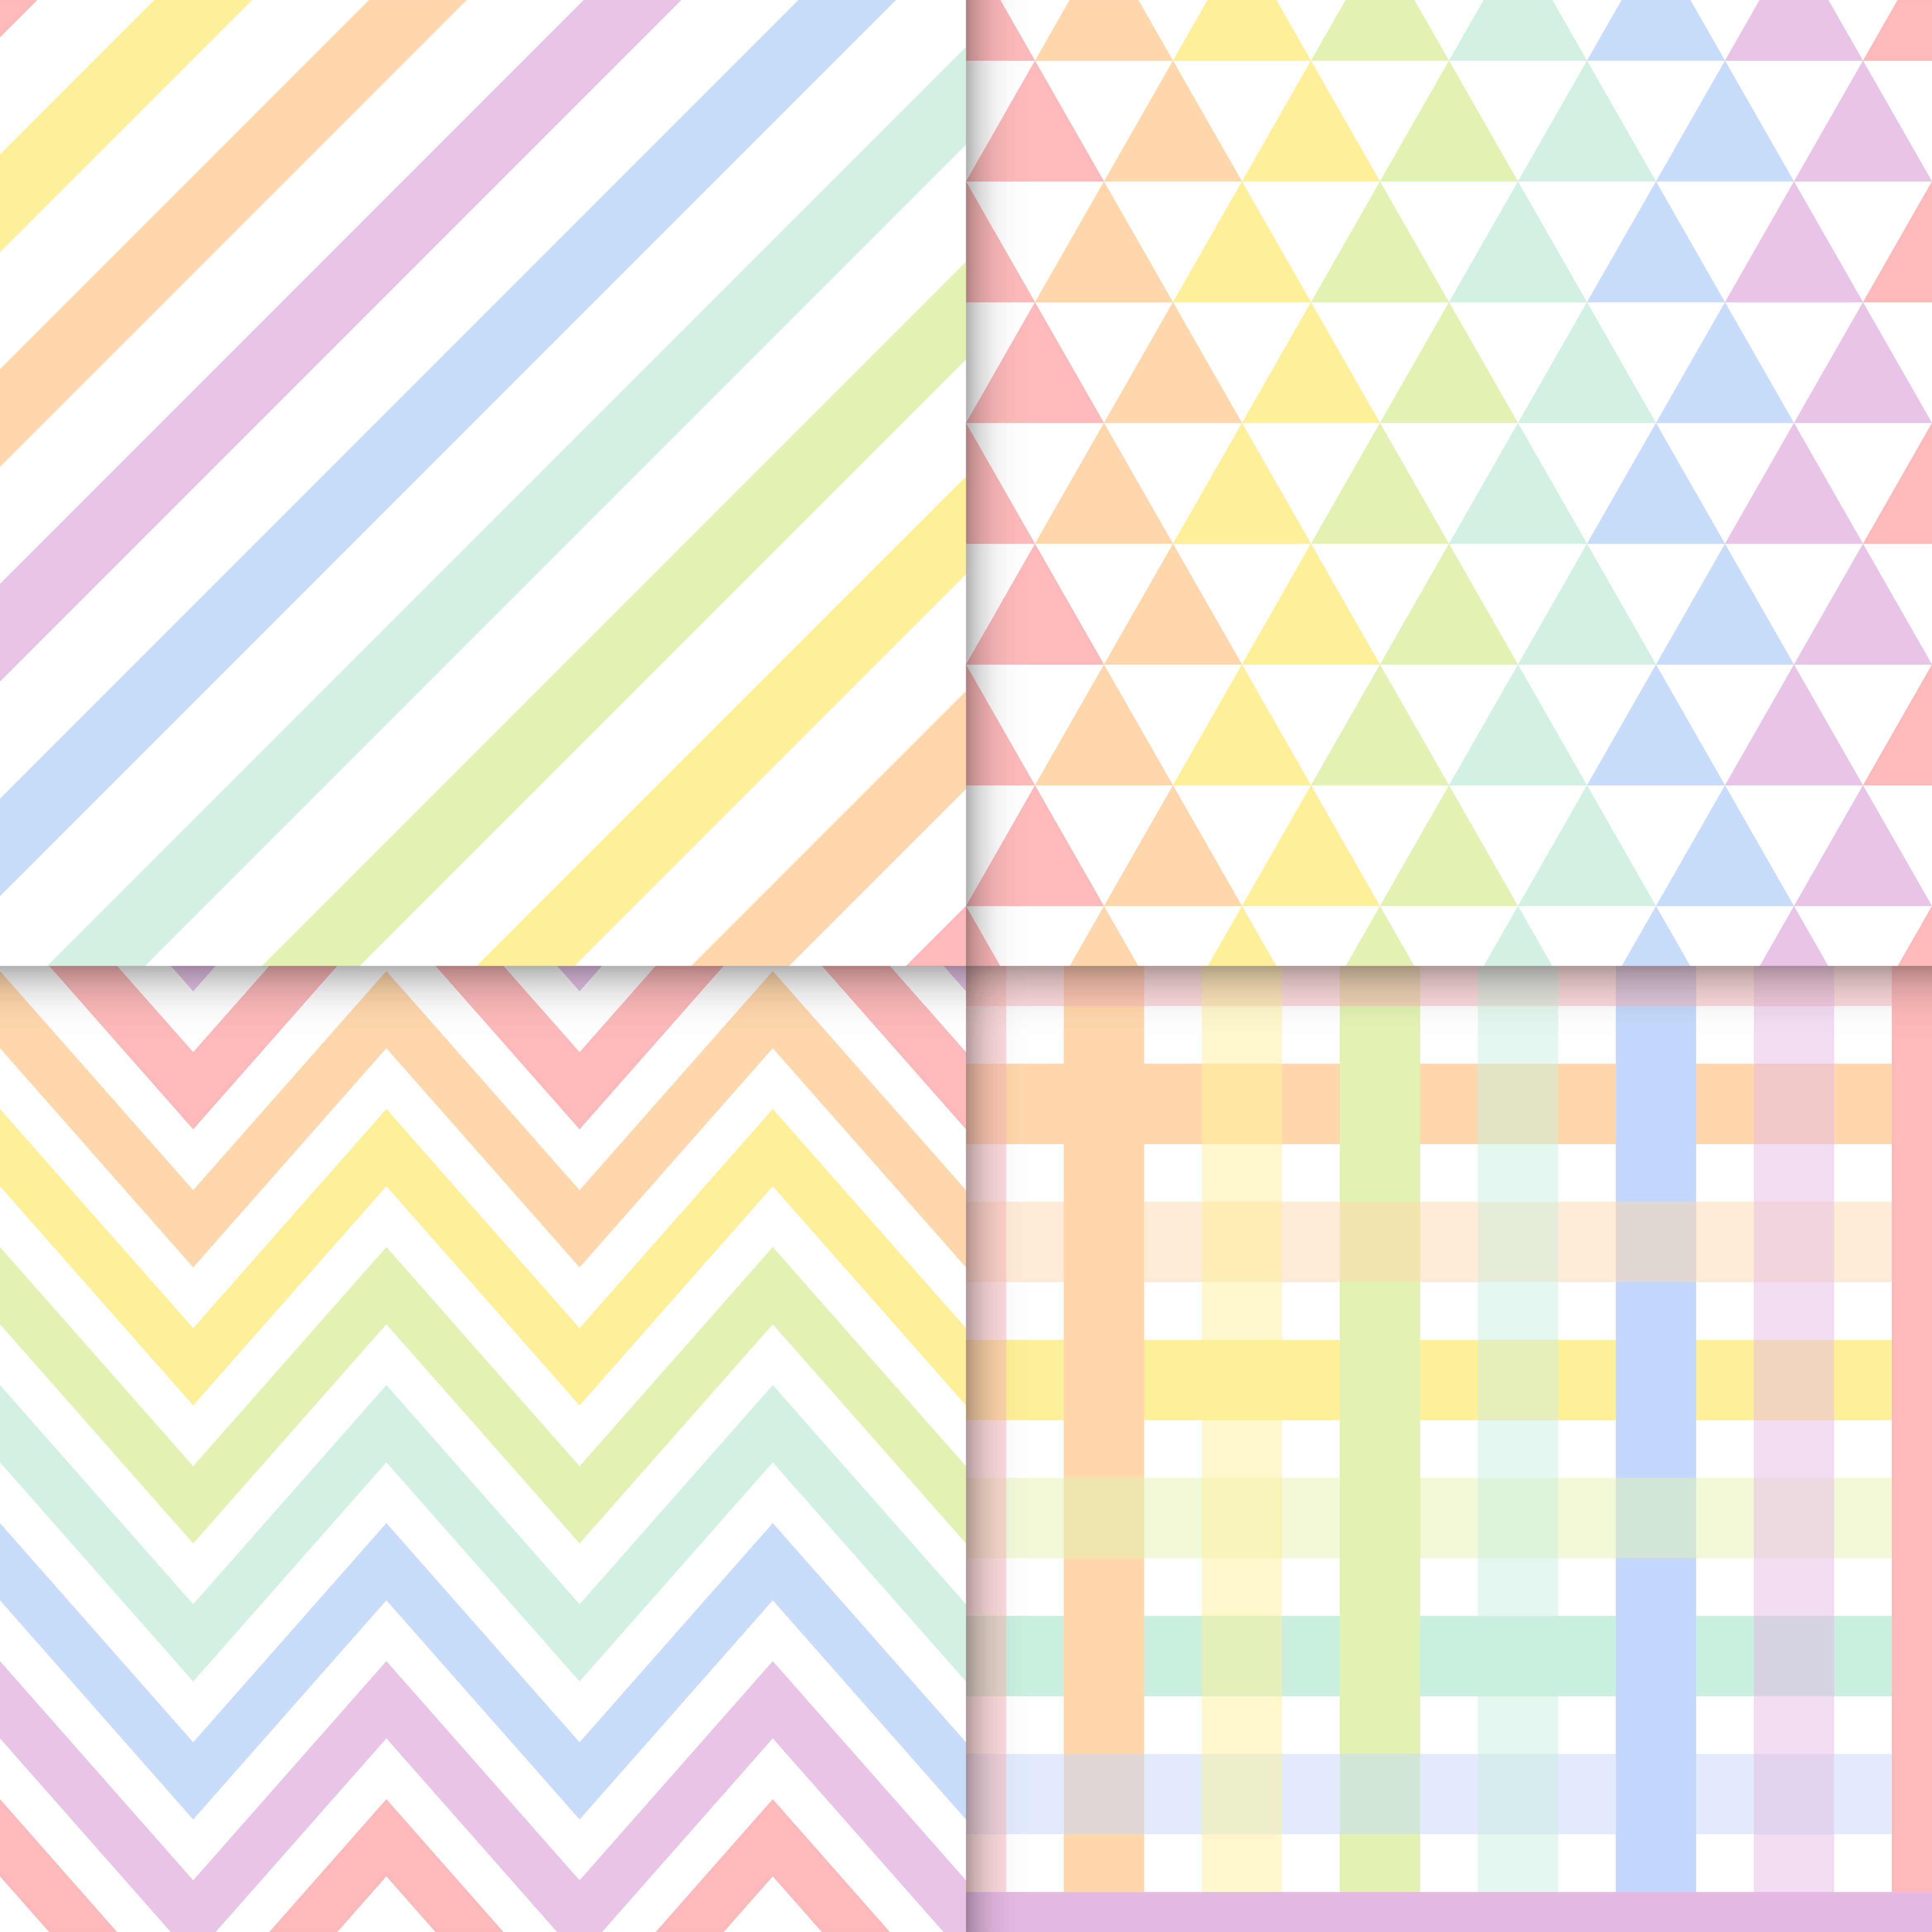 Seamless Pastel Patterns Vector Set Download Free